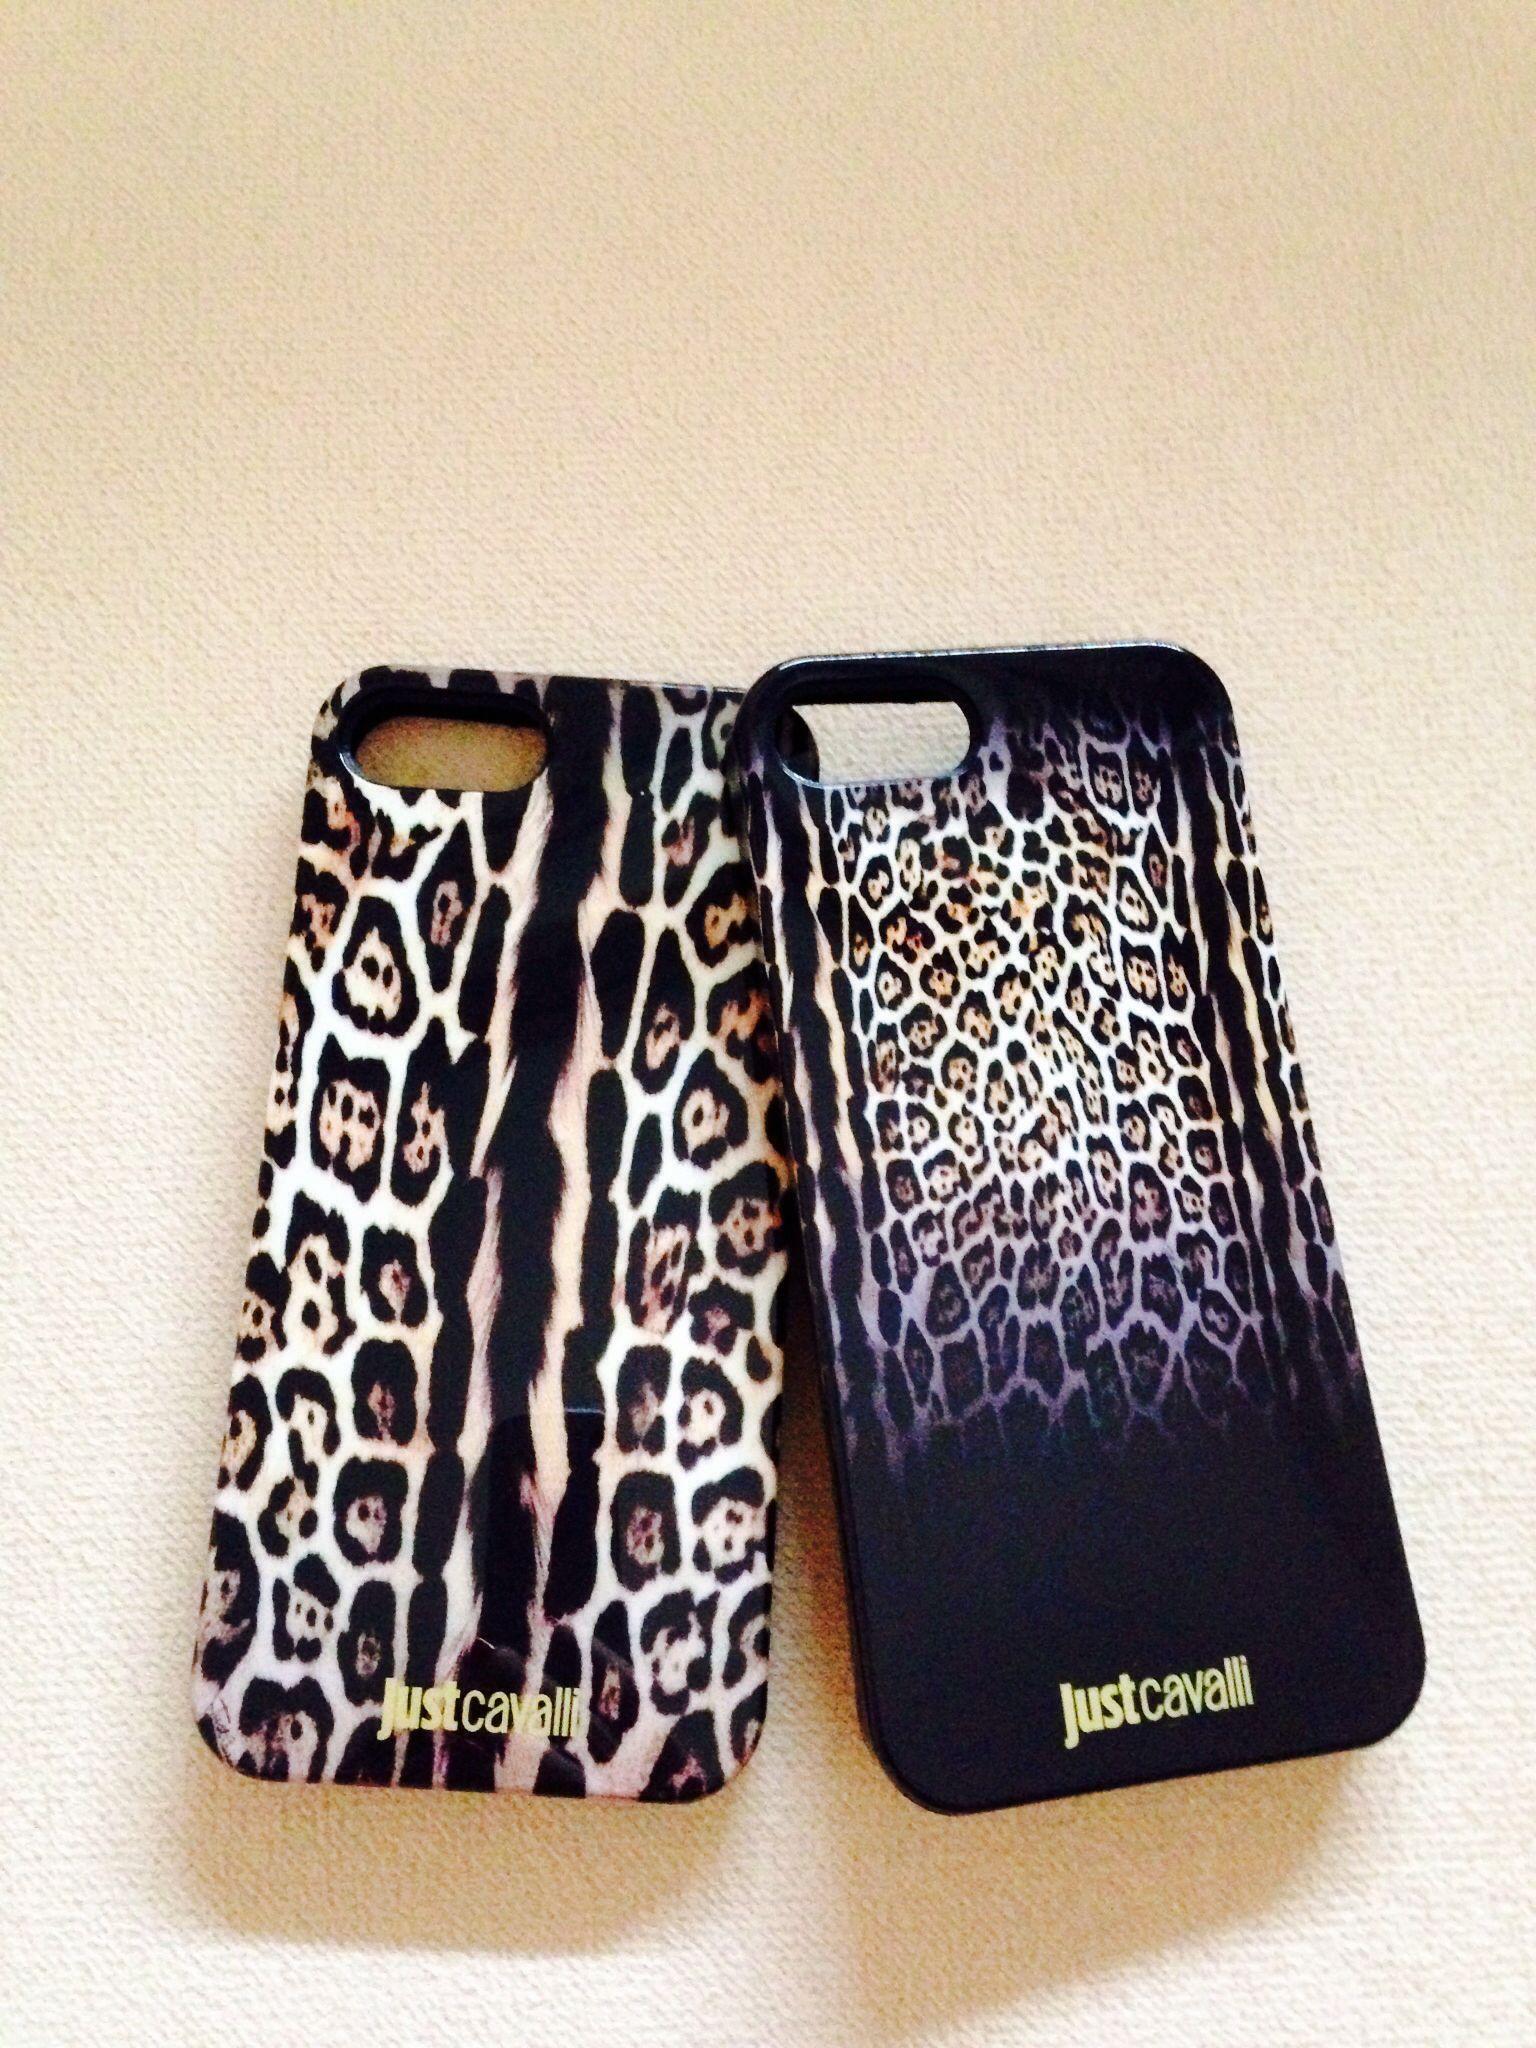 9dd85ae737820 Just cavalli leopard cover iphone @Robert Goris Osborn Cavalli @Brooke  Williams Klaers Schwanz Italian Style